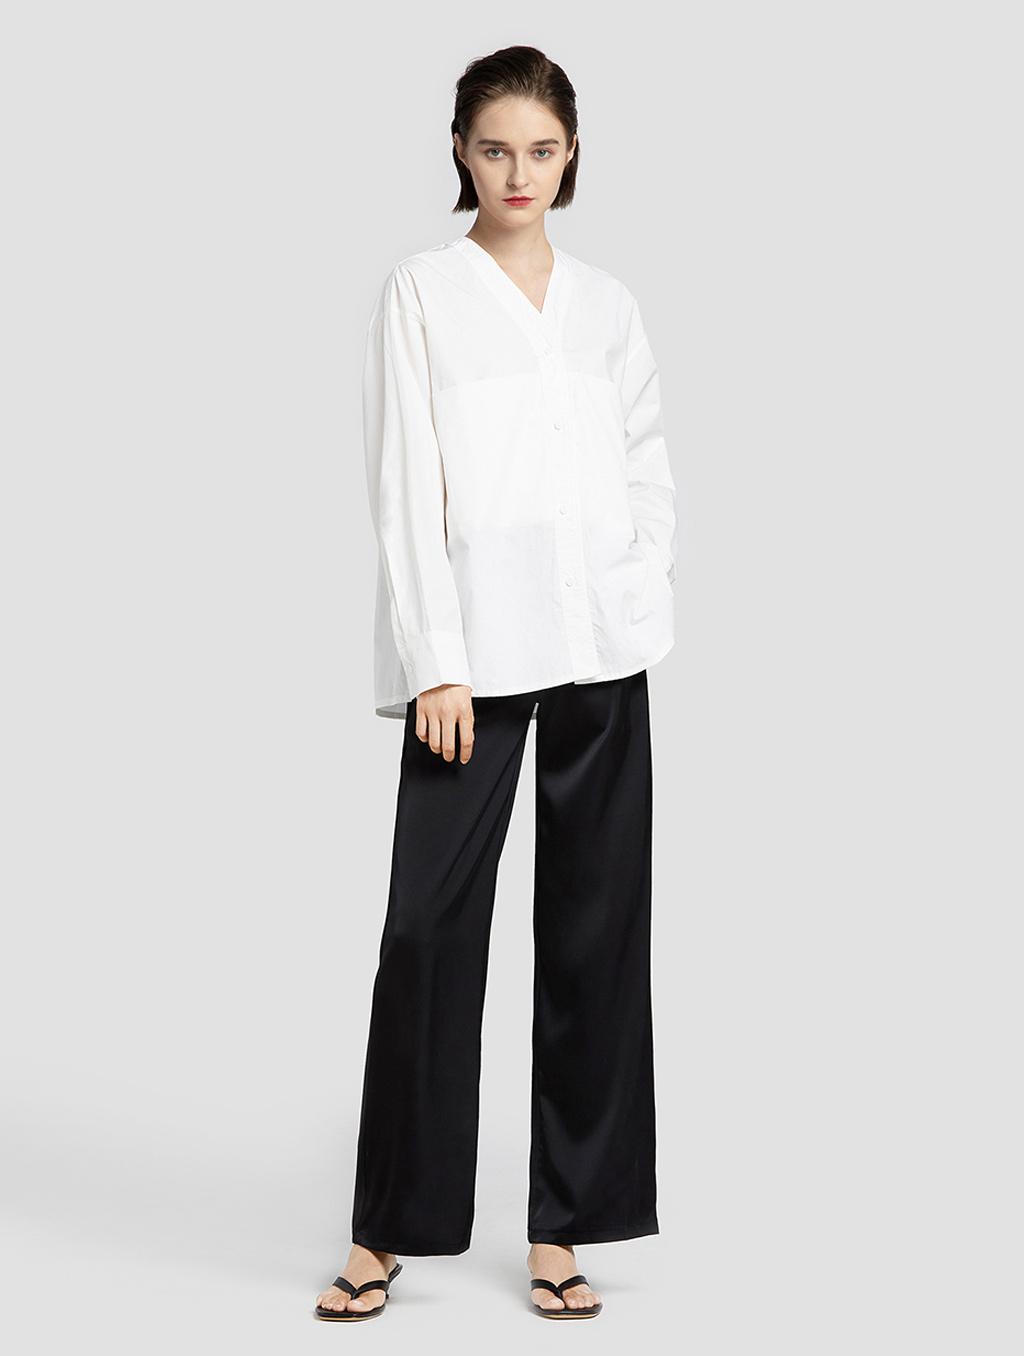 V neck panelled blouse- whole body- white